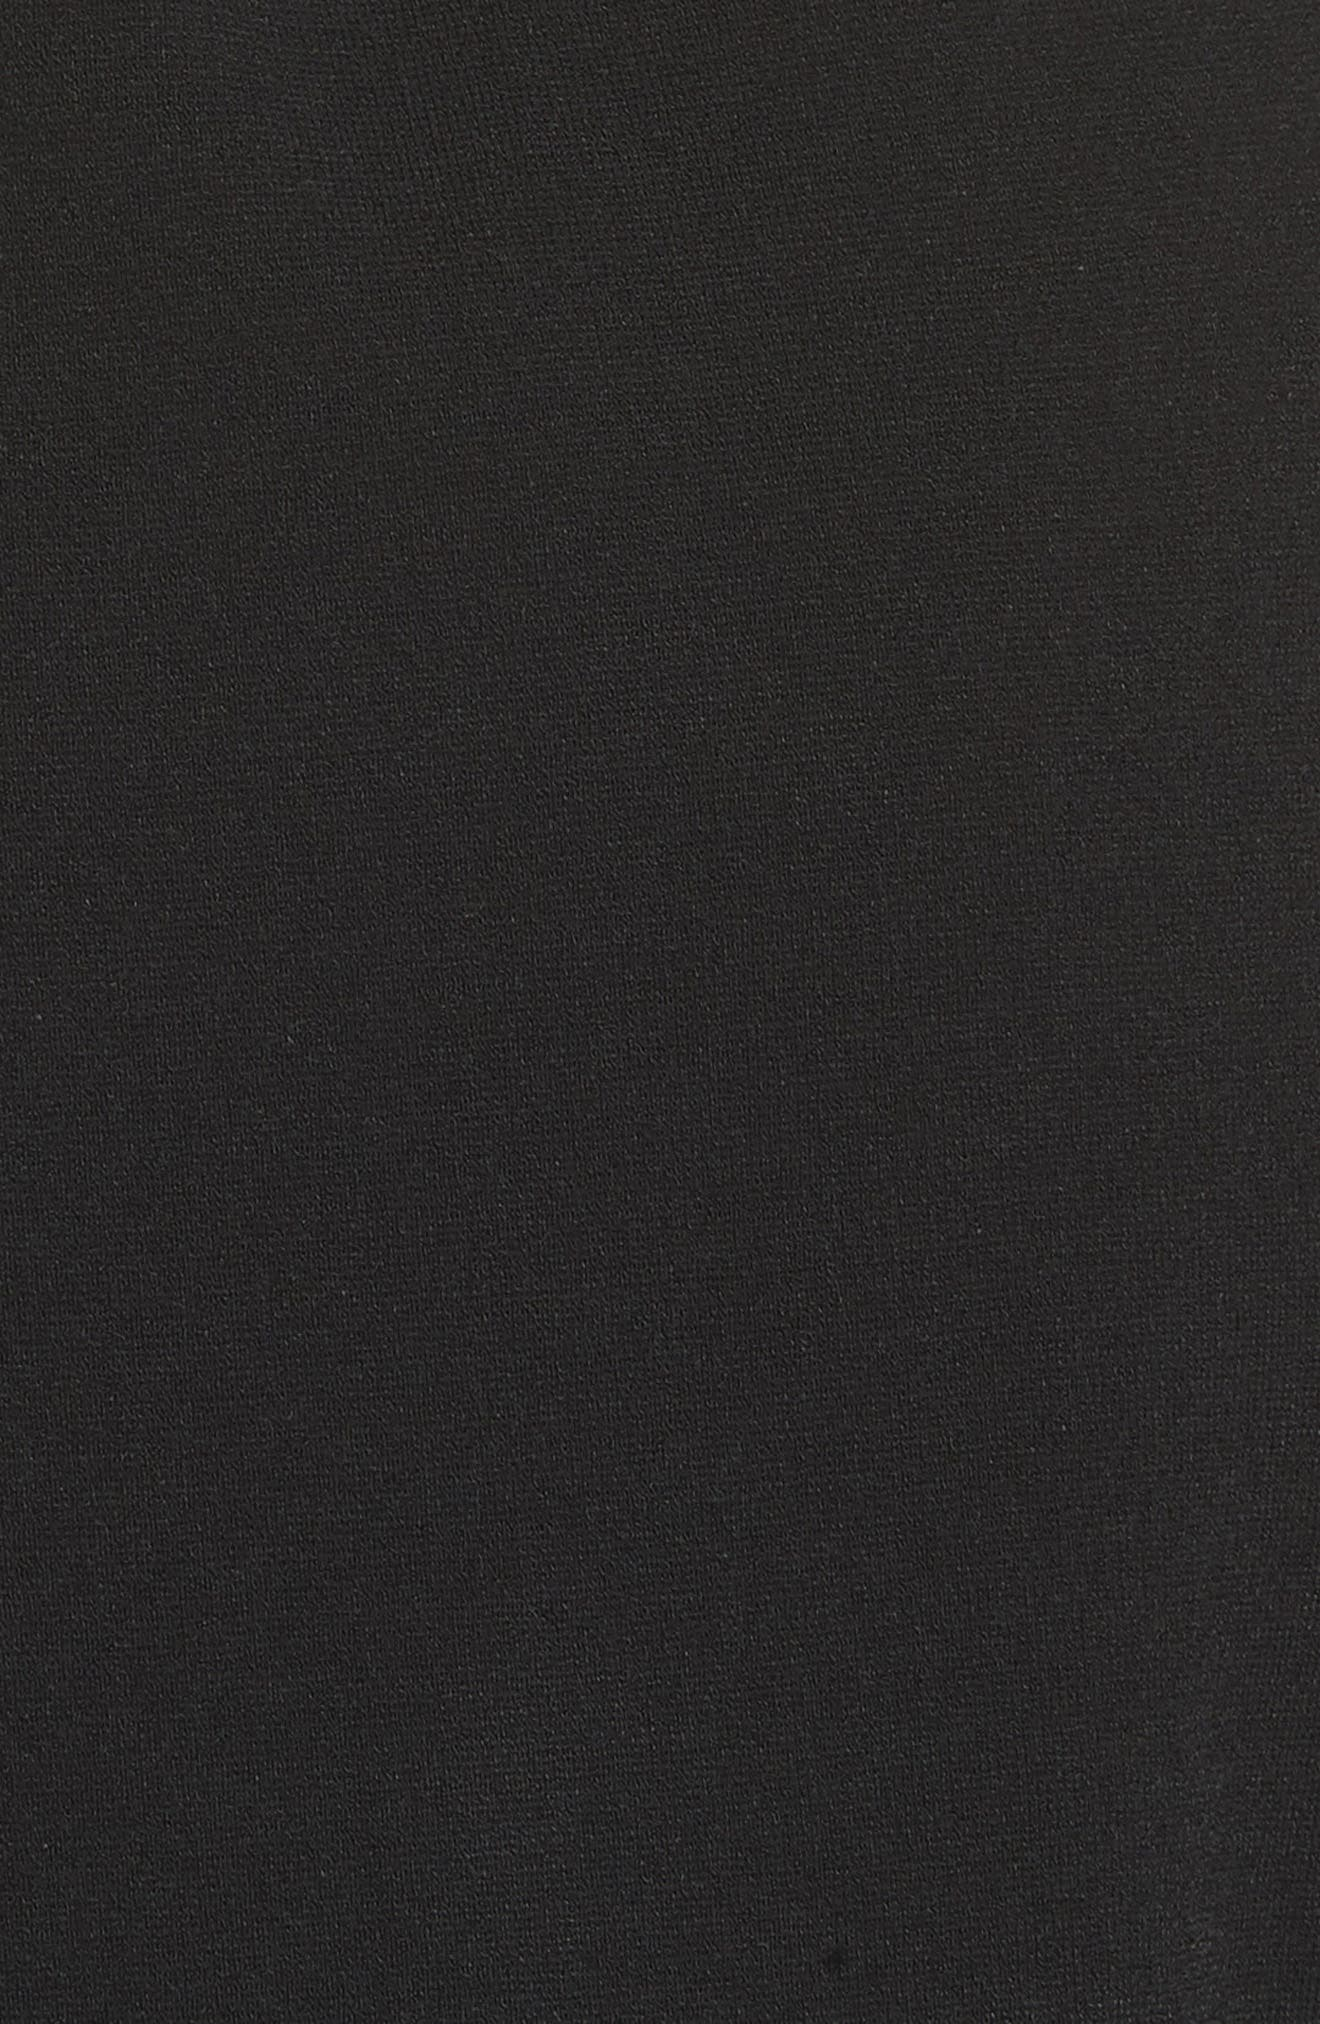 Diane von Furstenberg Wrap Sweater Dress,                             Alternate thumbnail 5, color,                             006